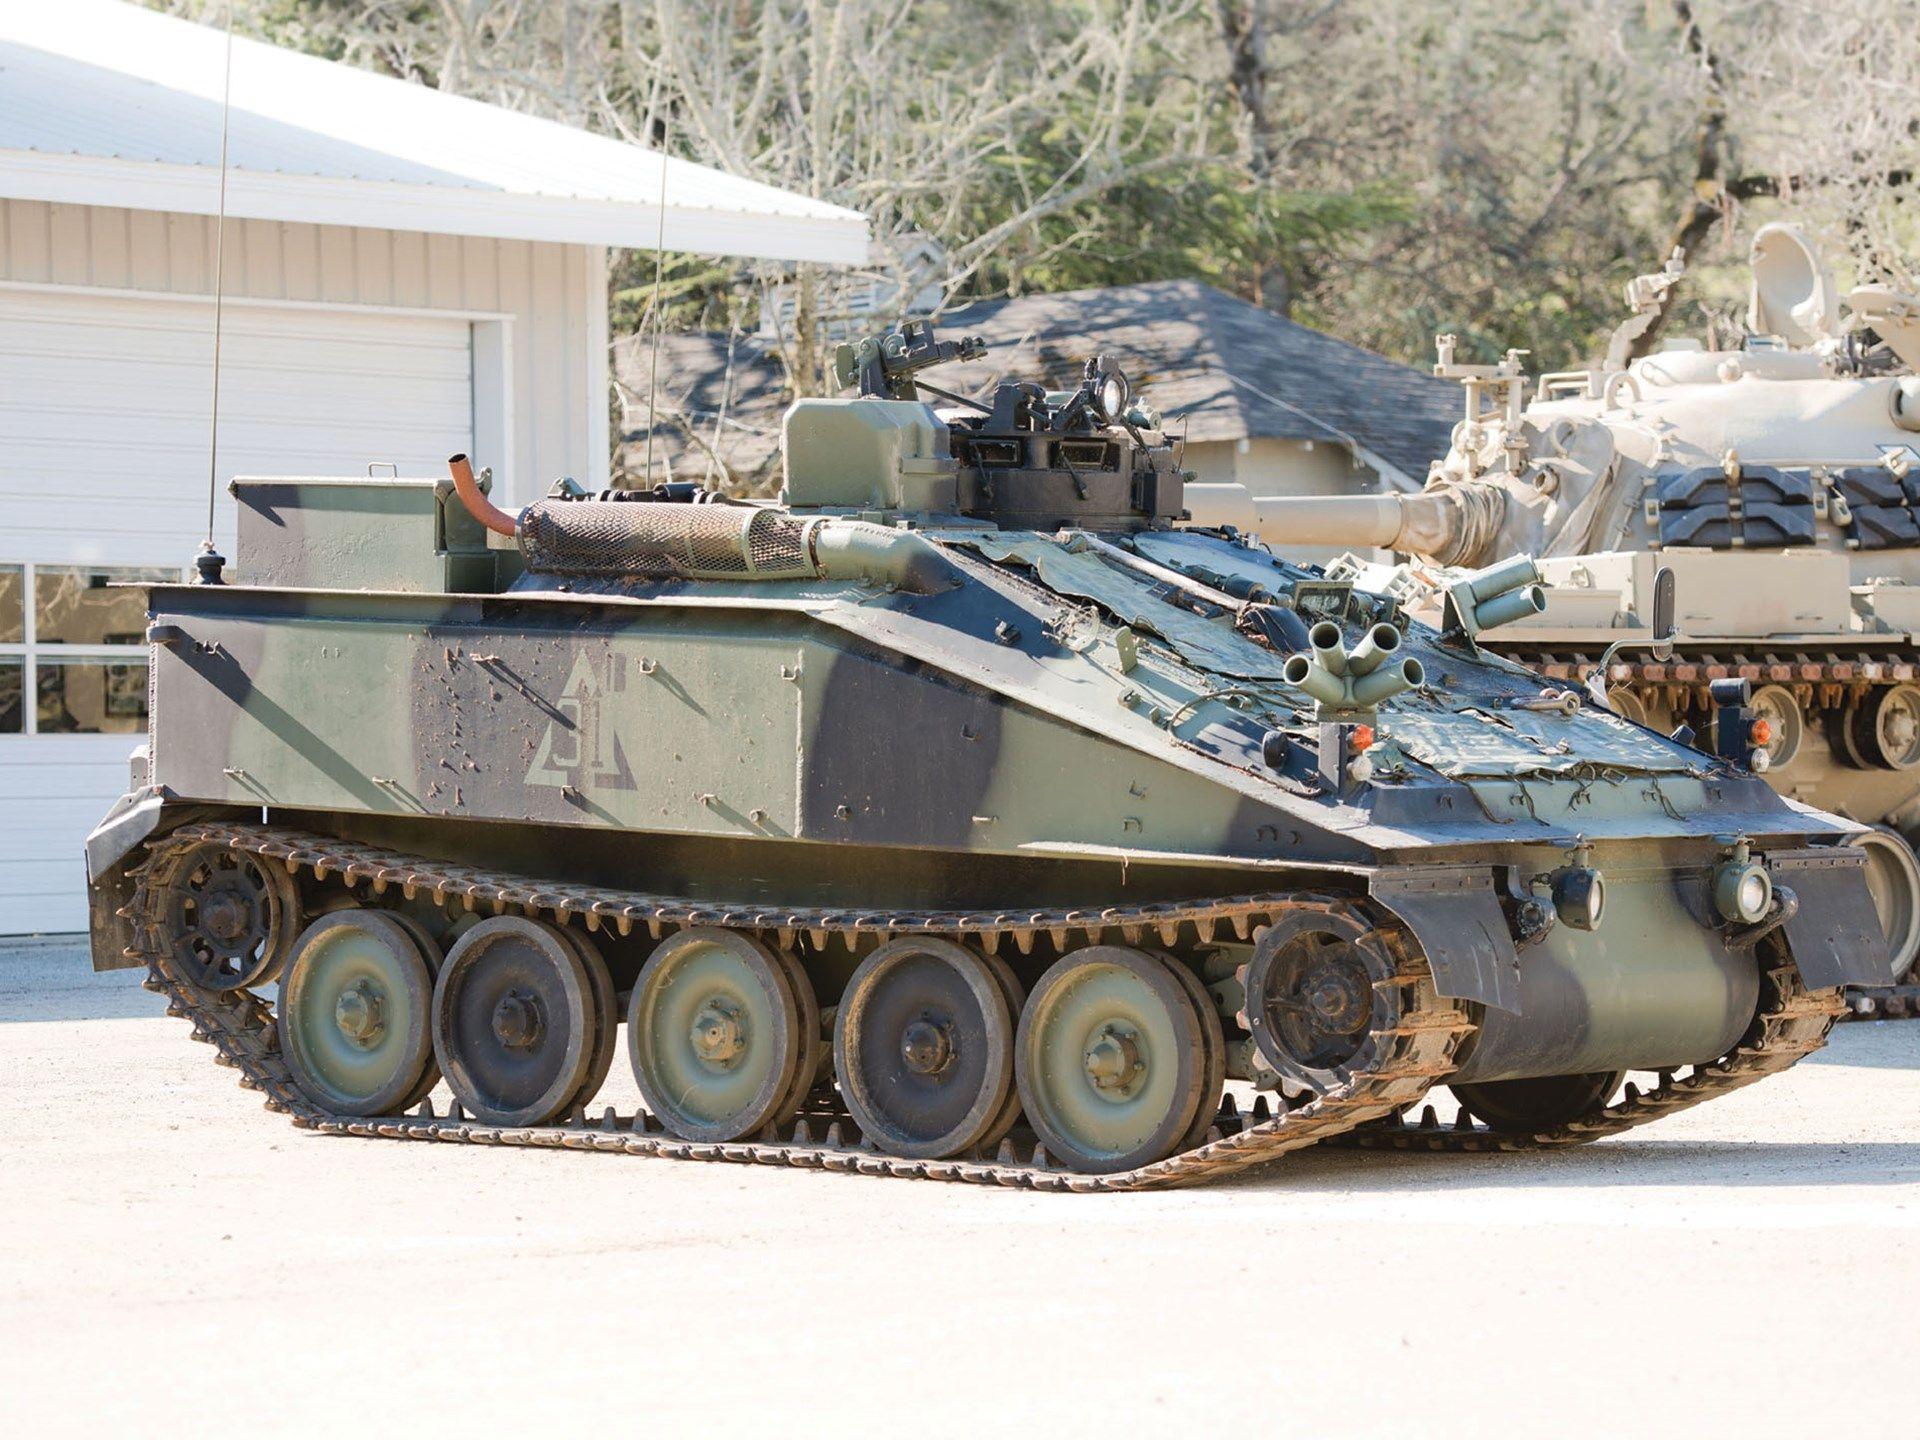 FV102 Striker Anti-Tank Guided Missile (Atgm) Carrier